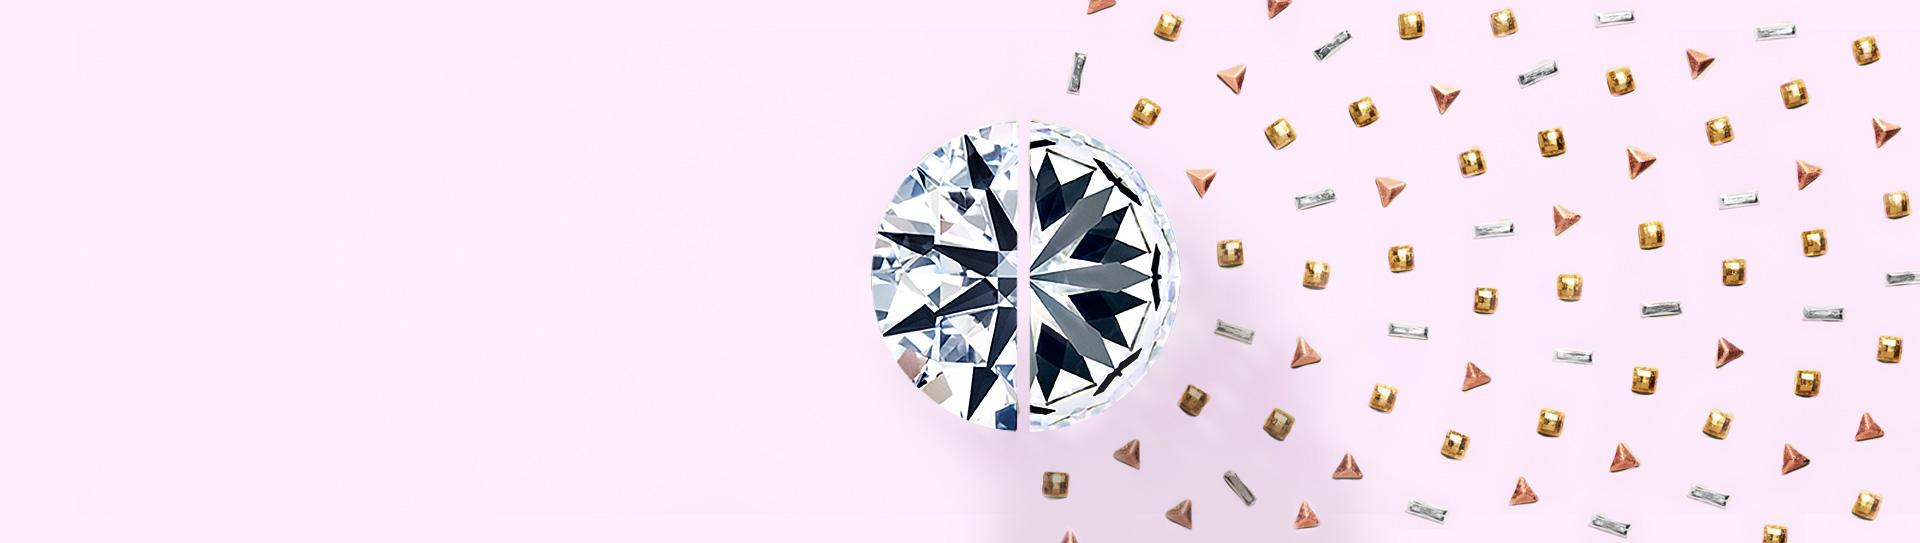 True Hearts, perfectly symmetrical diamond.